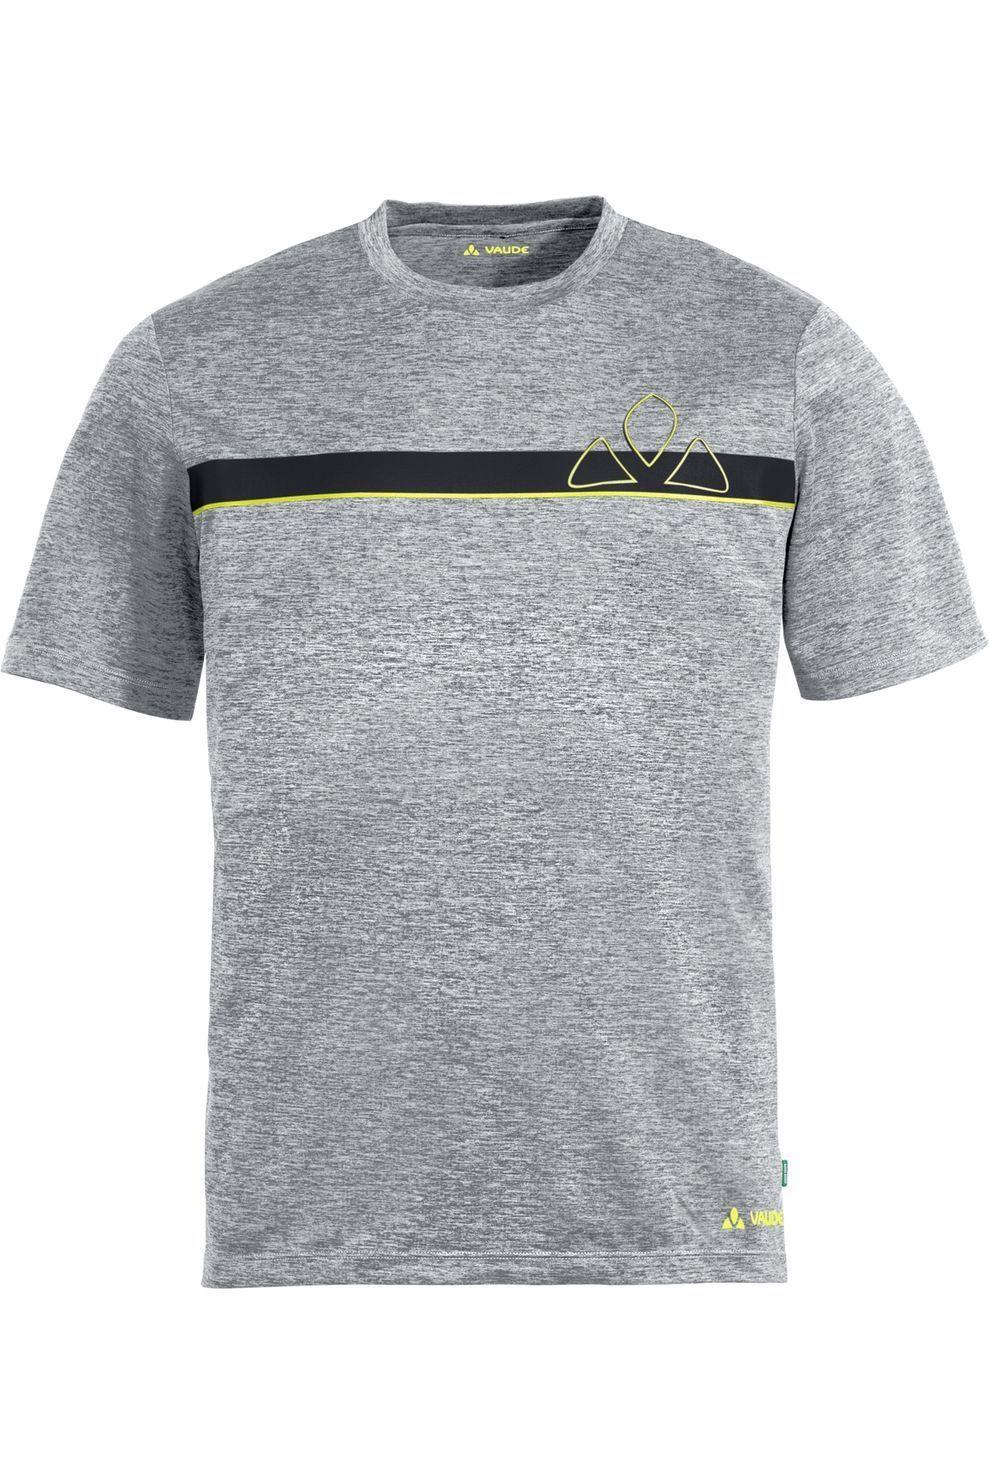 VAUDE T-Shirt Bracket voor heren - Zwart/Mengeling - Maten: M, L, XL, XXL